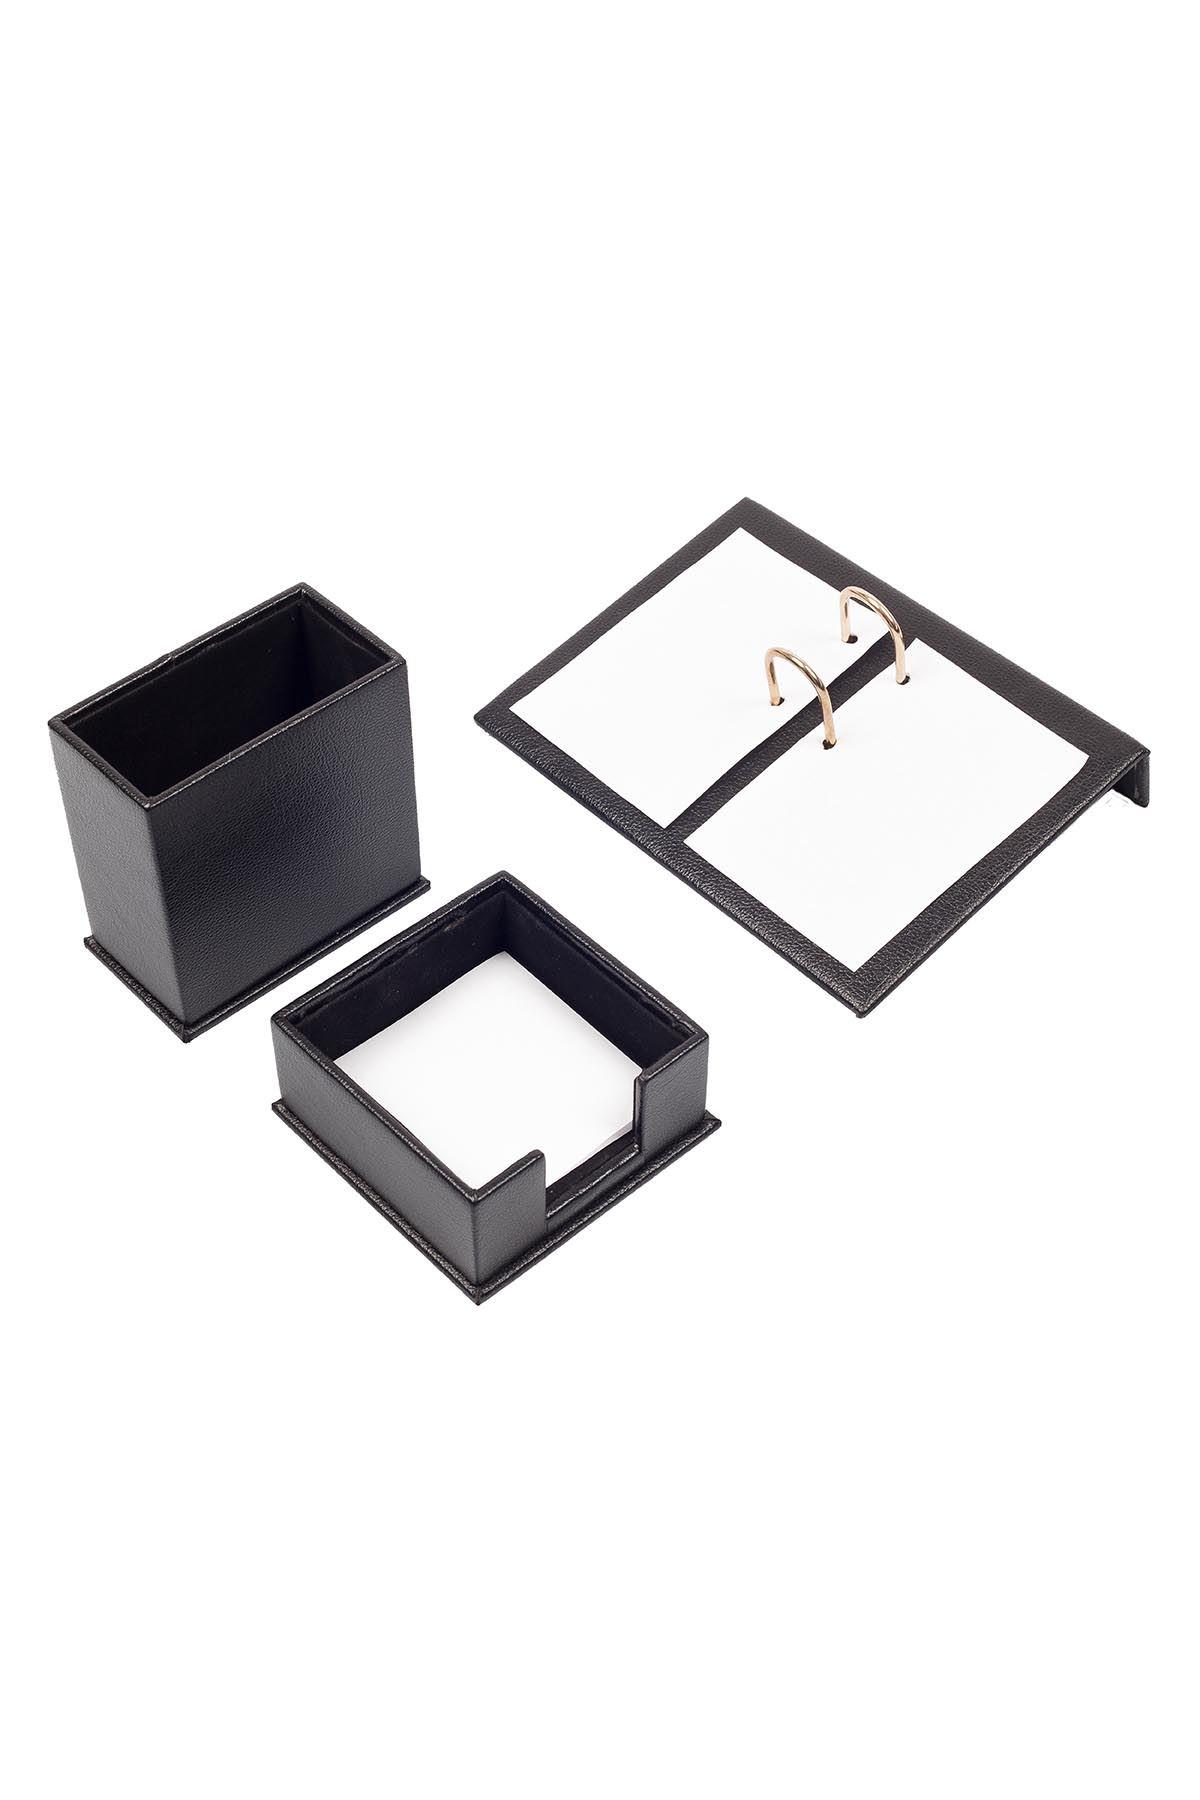 Leather Desk Accessories set of 3 Black| Desk Set Accessories | Desktop Accessories | Desk Accessories | Desk Organizers